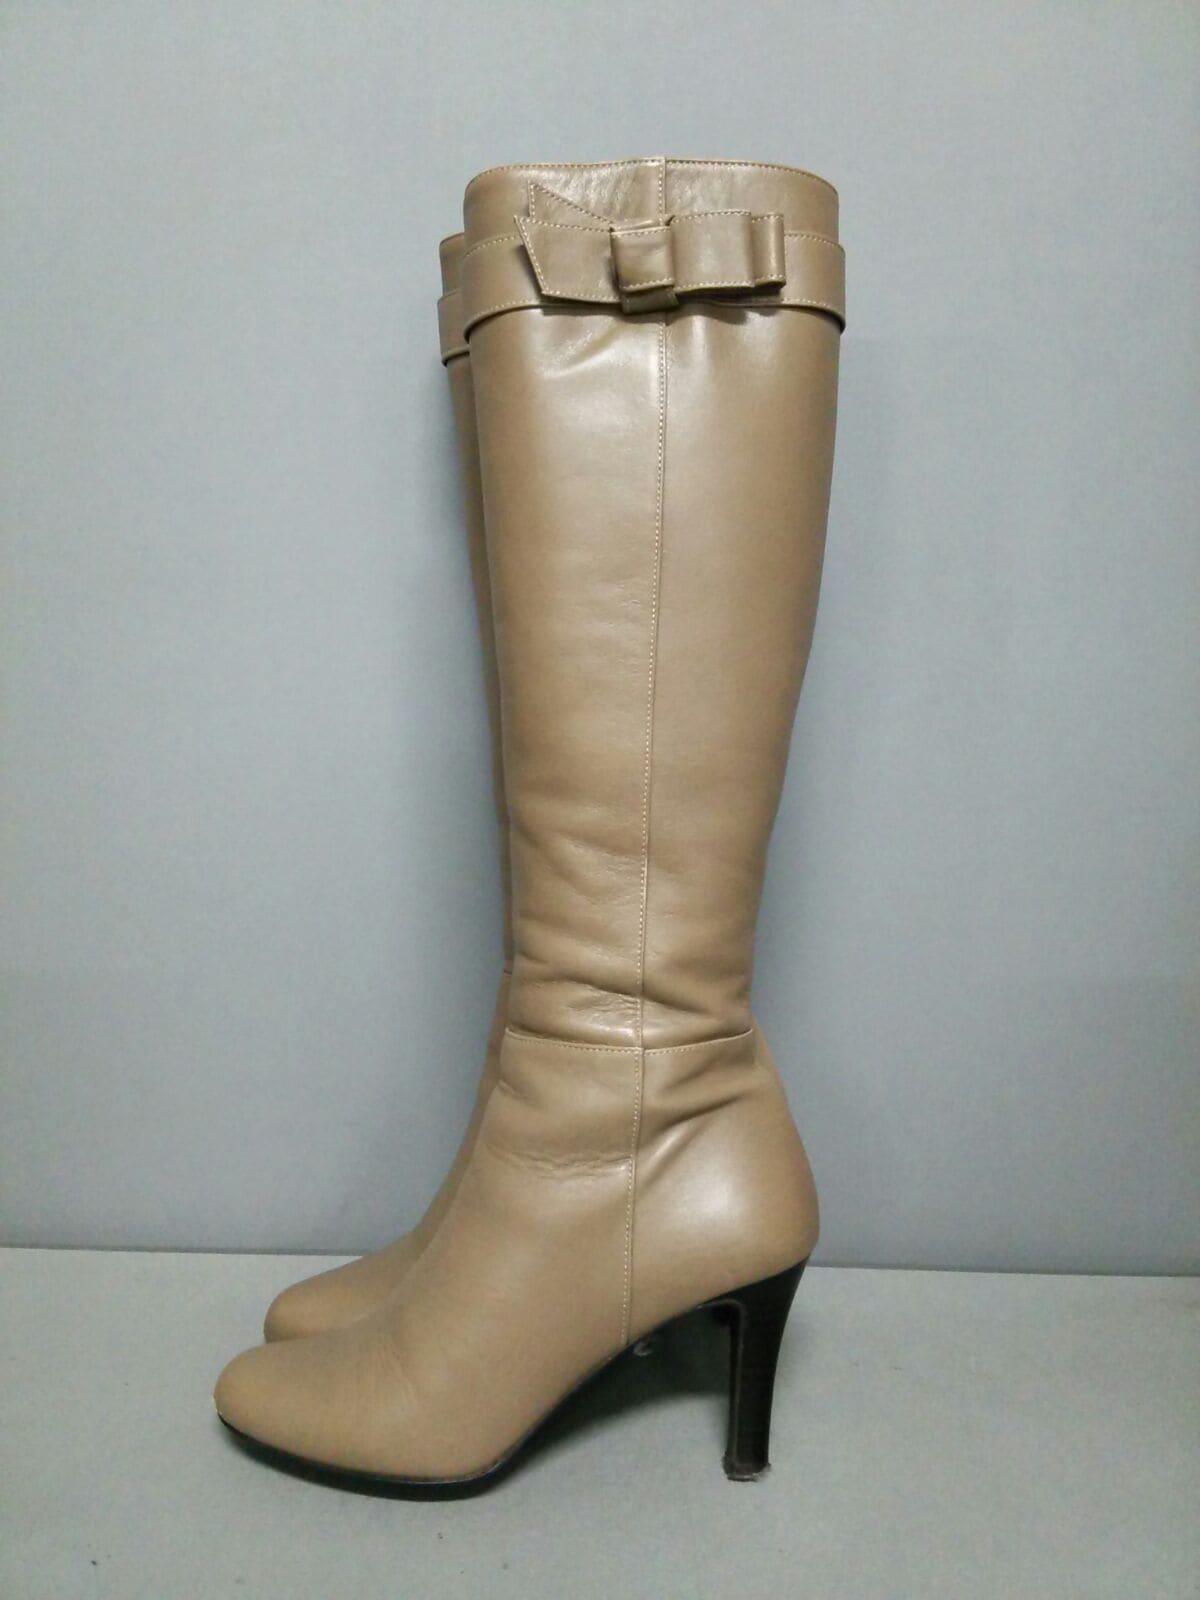 STRAWBERRY-FIELDS(ストロベリーフィールズ)のブーツ